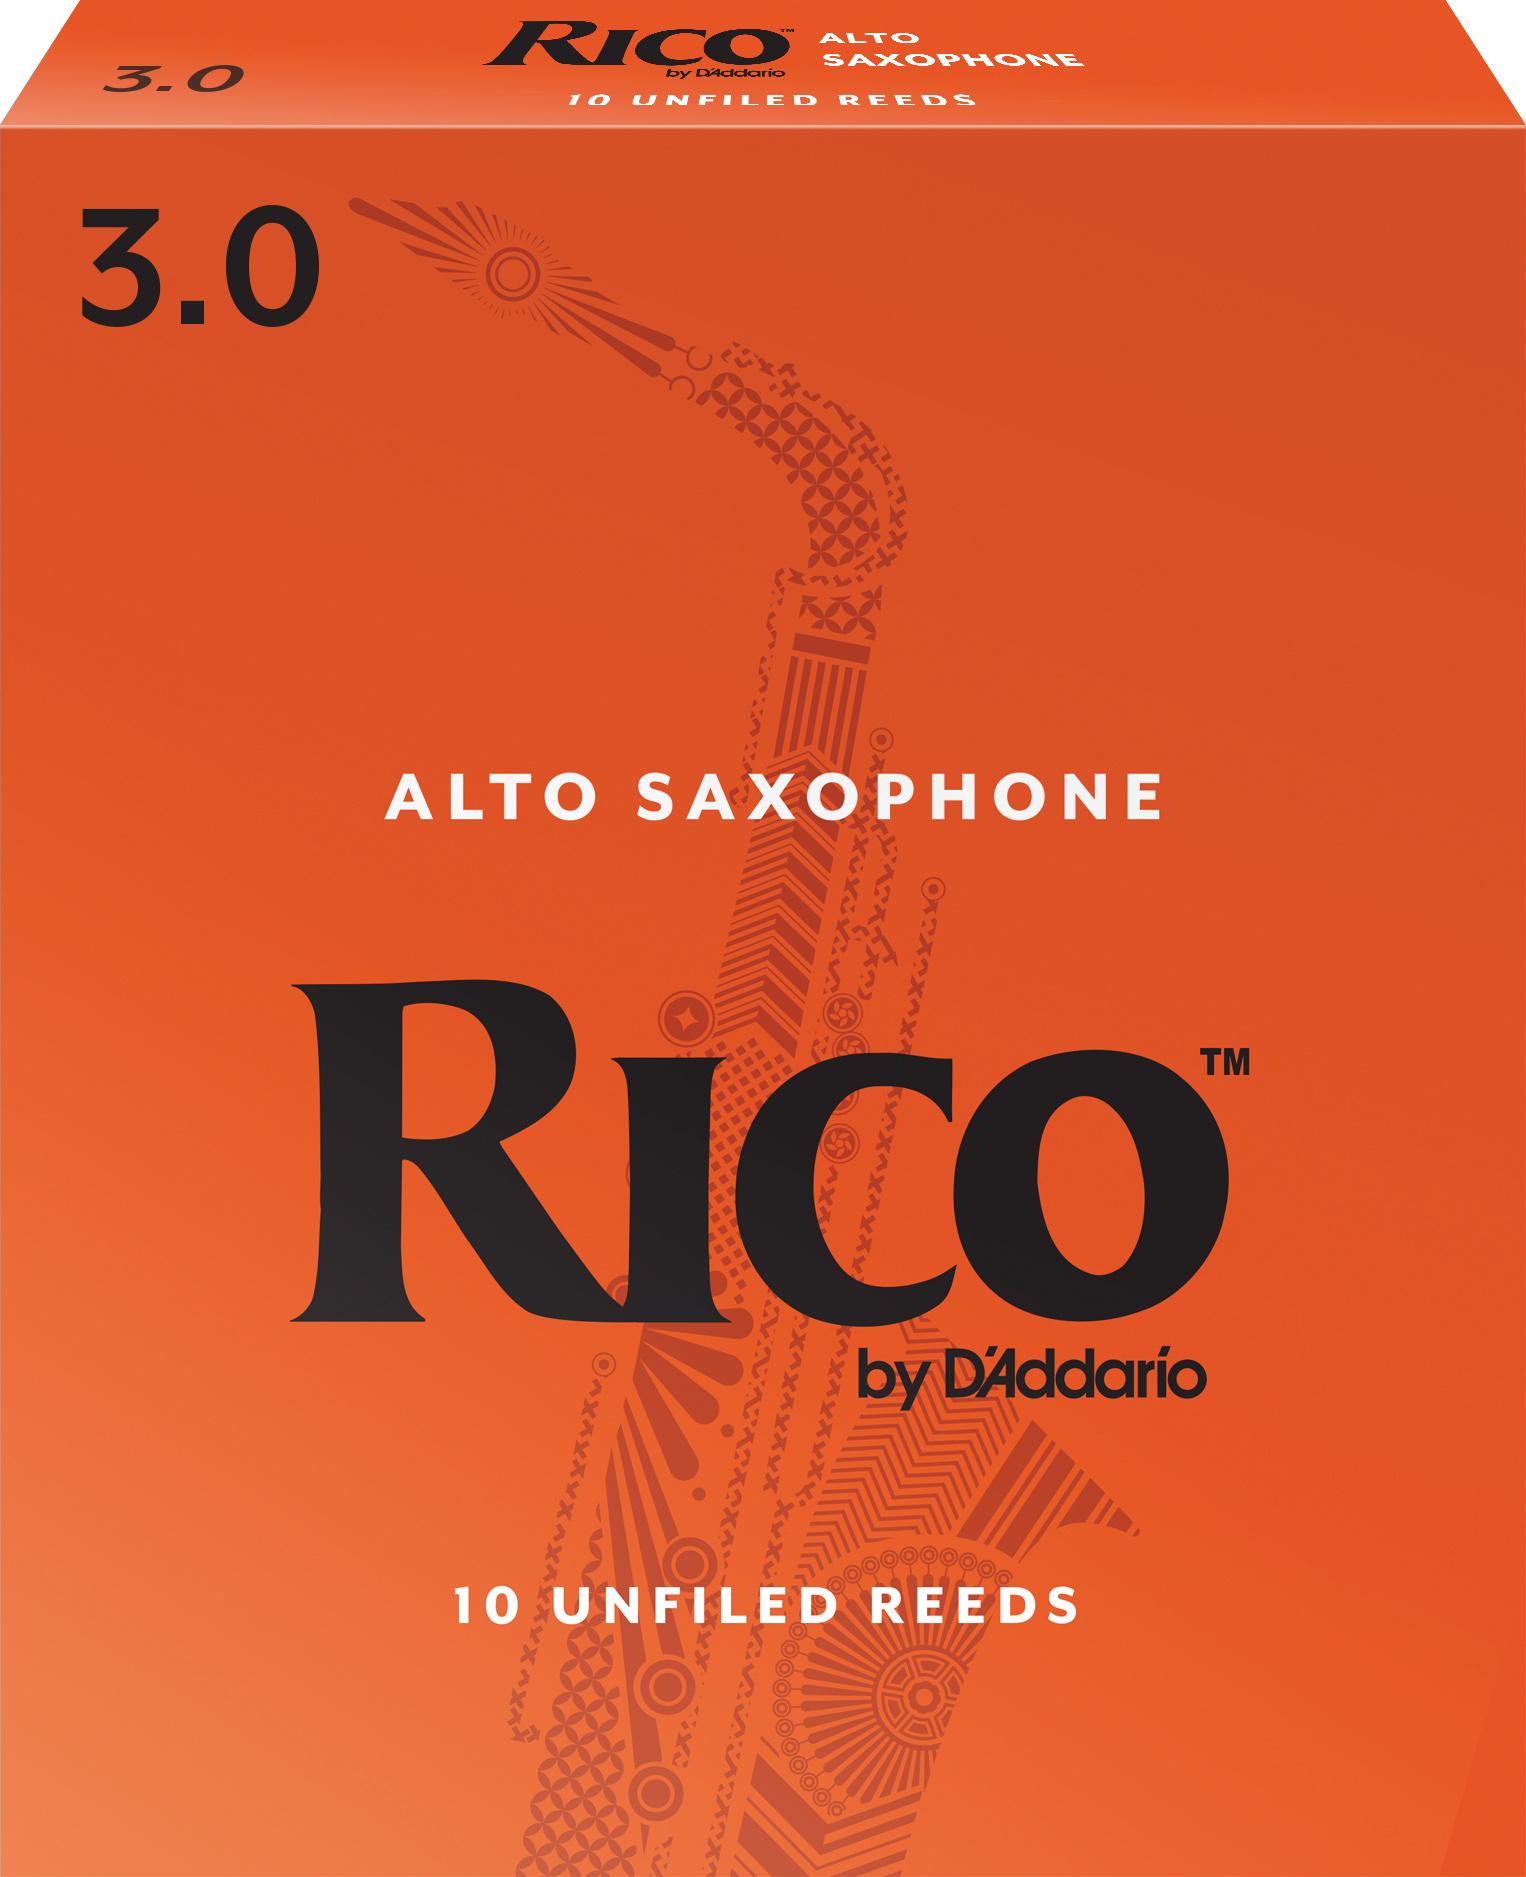 Rico by D'Addario Alto Sax Reeds 10-pack, Strength 3